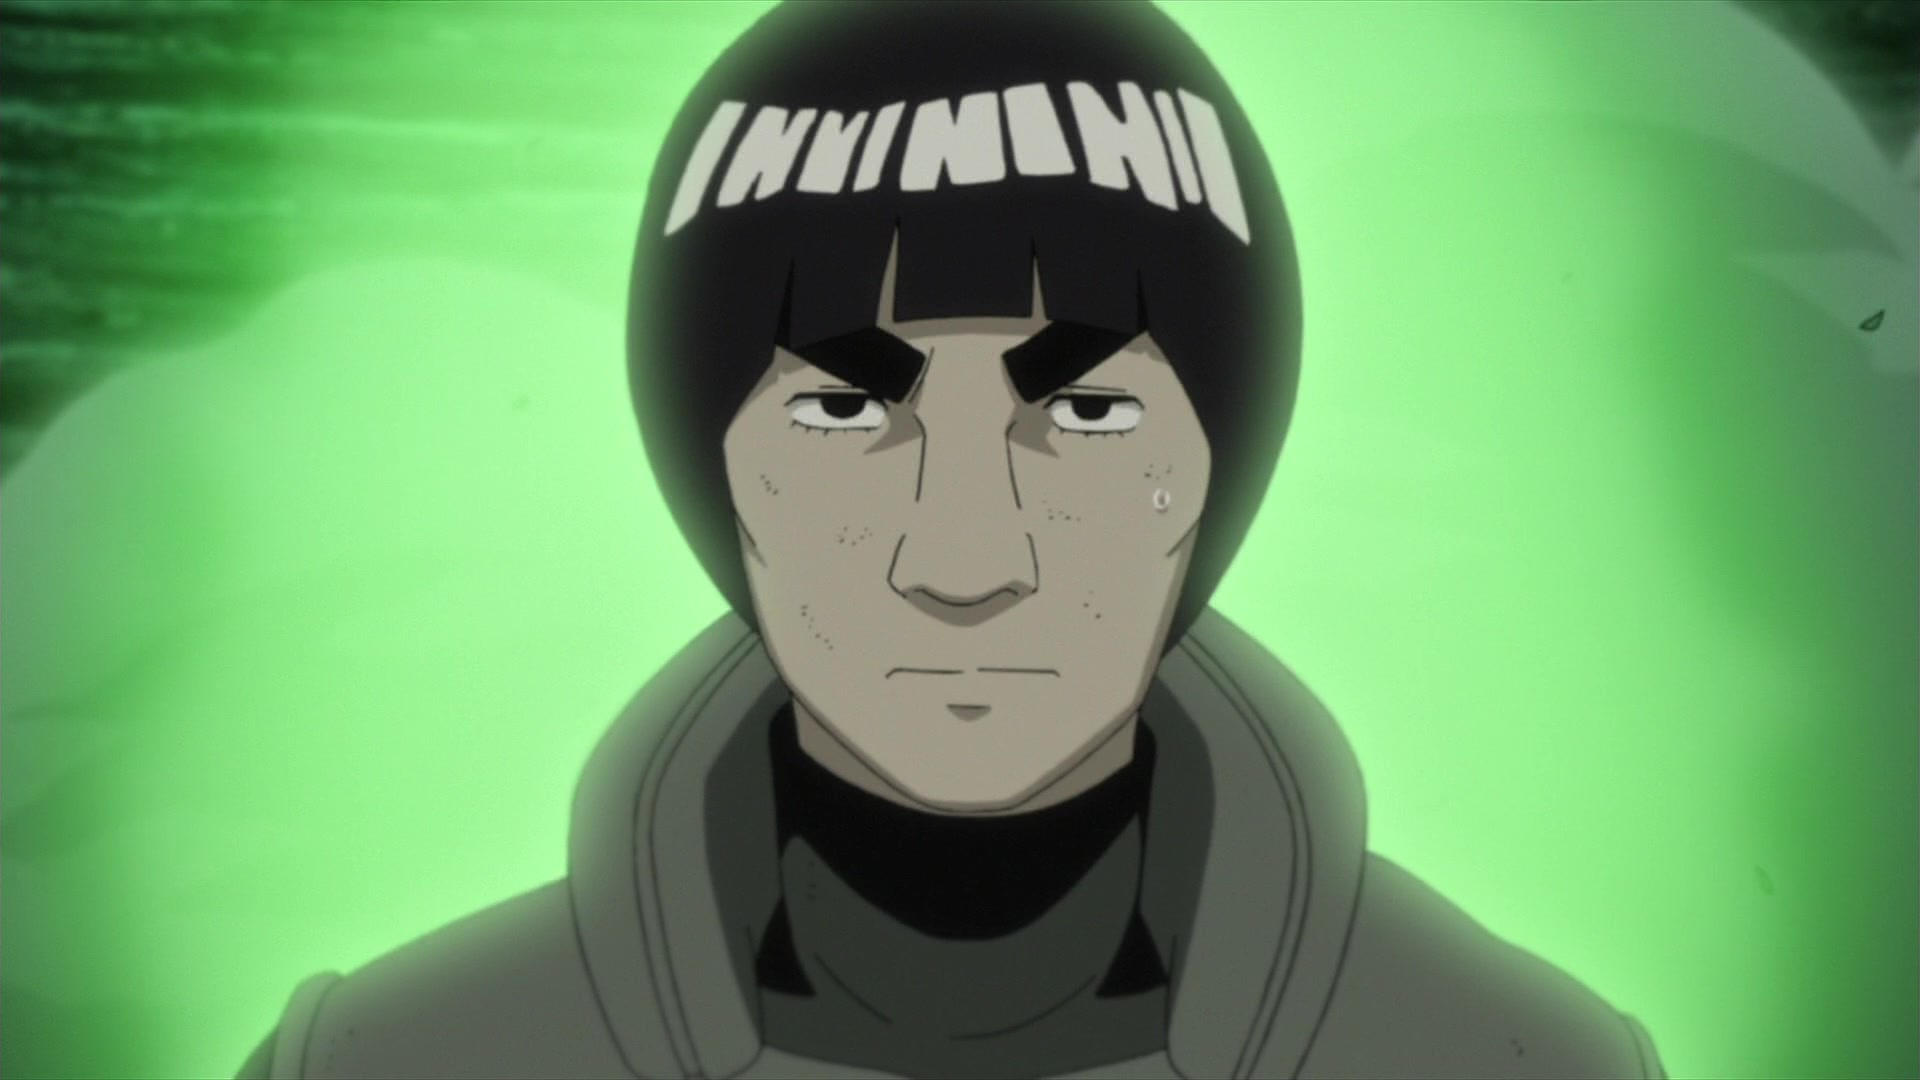 Naruto Shippuden: Season 17 Episode 418, The Blue Beast vs